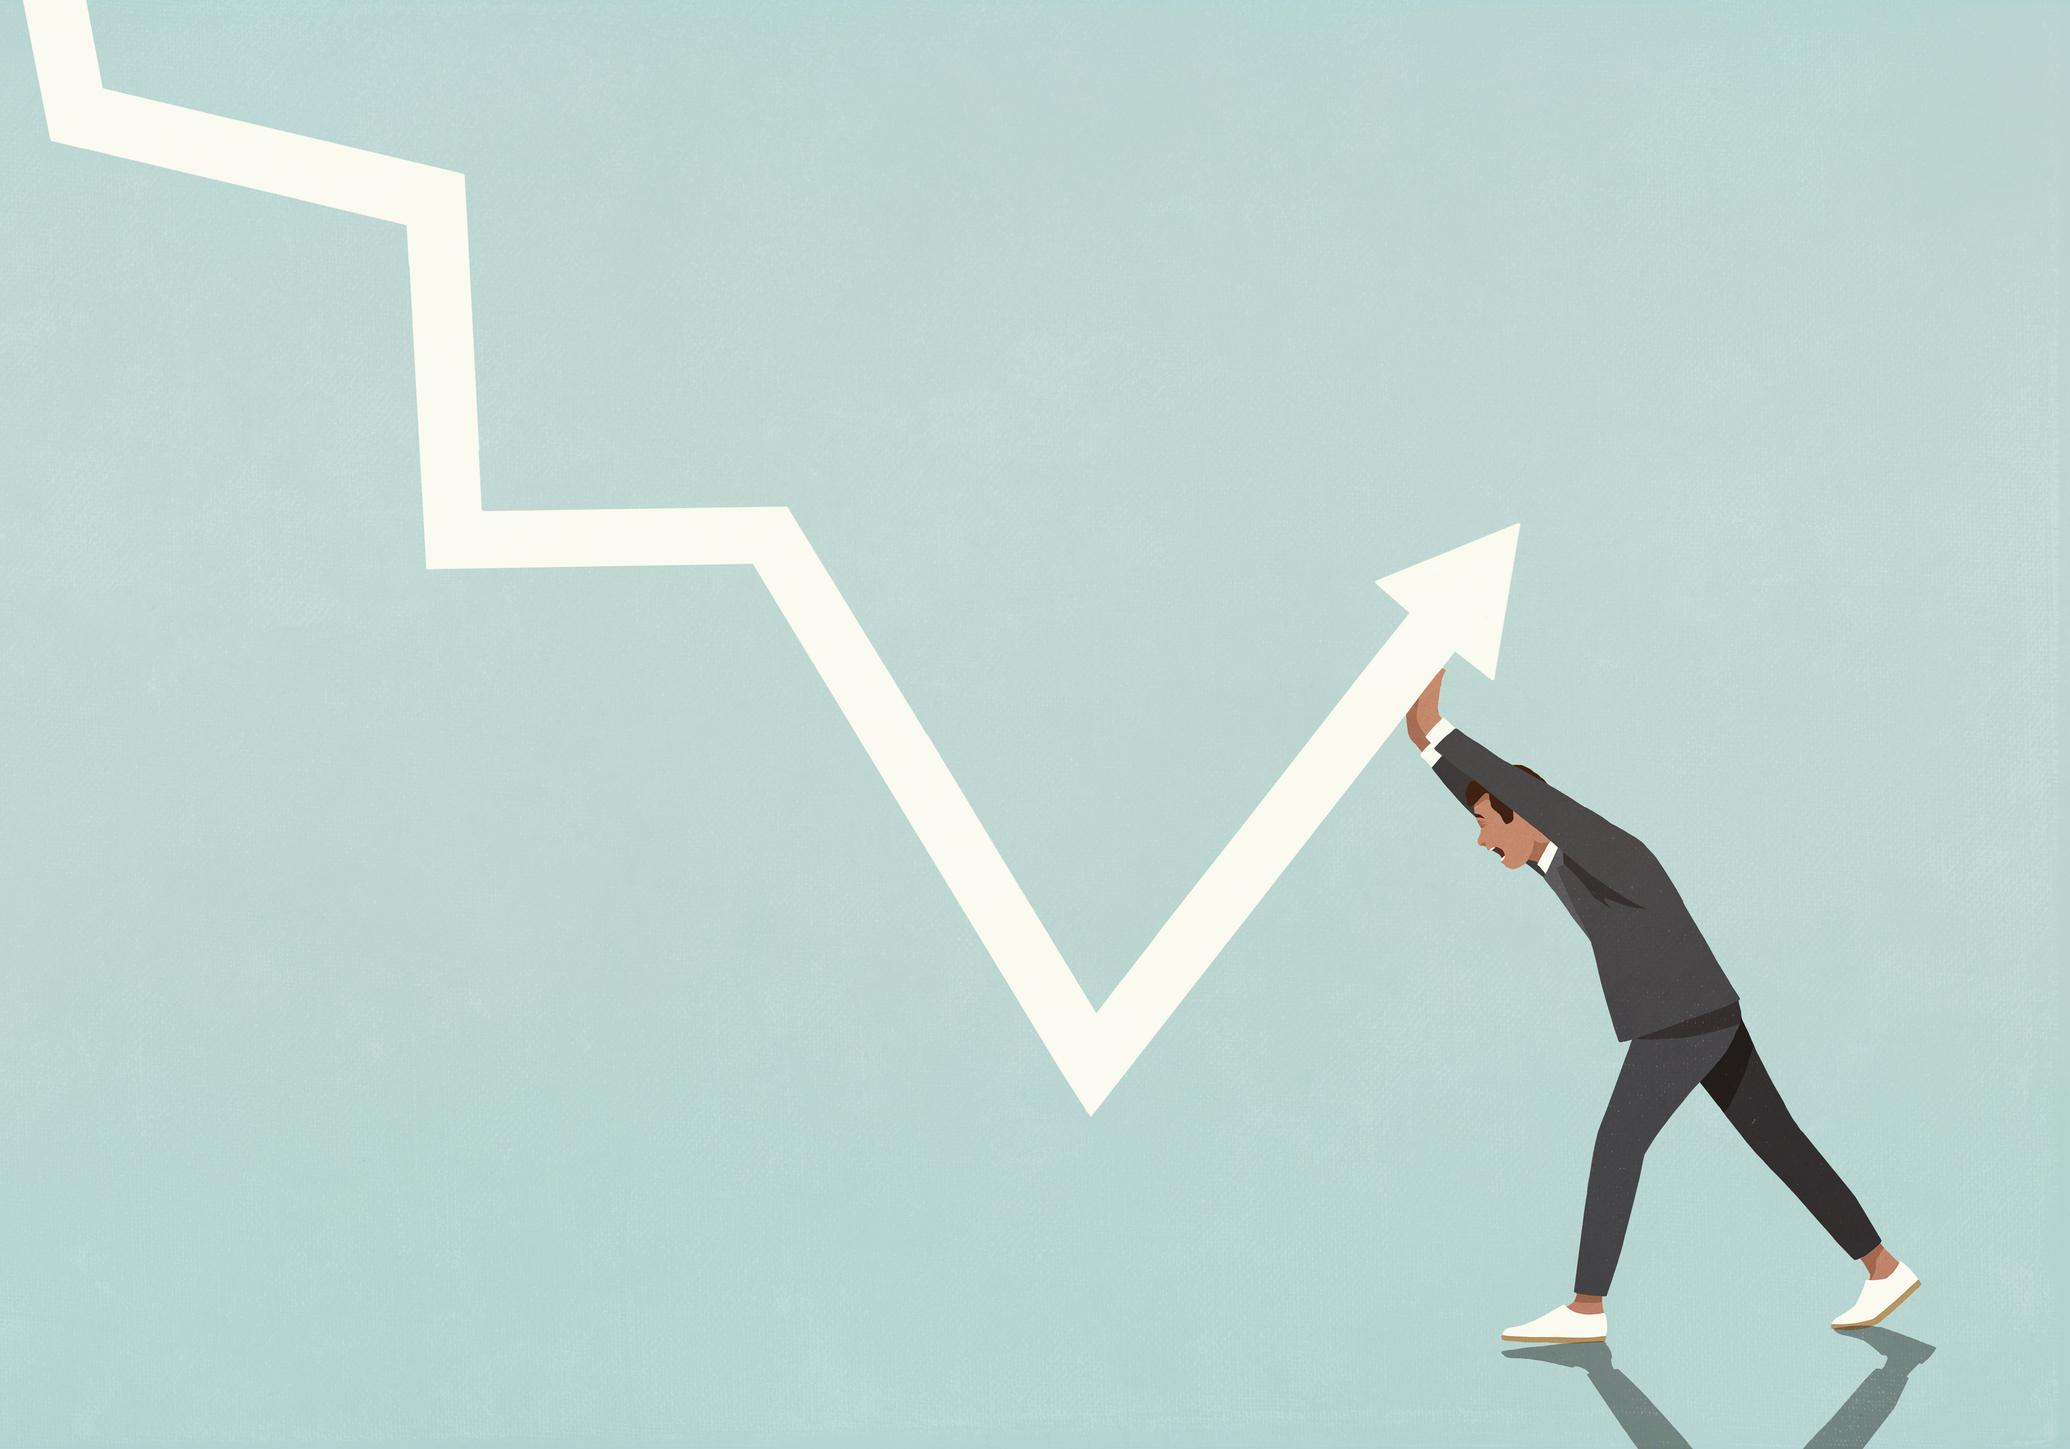 Businessman struggling to move data arrow upwards